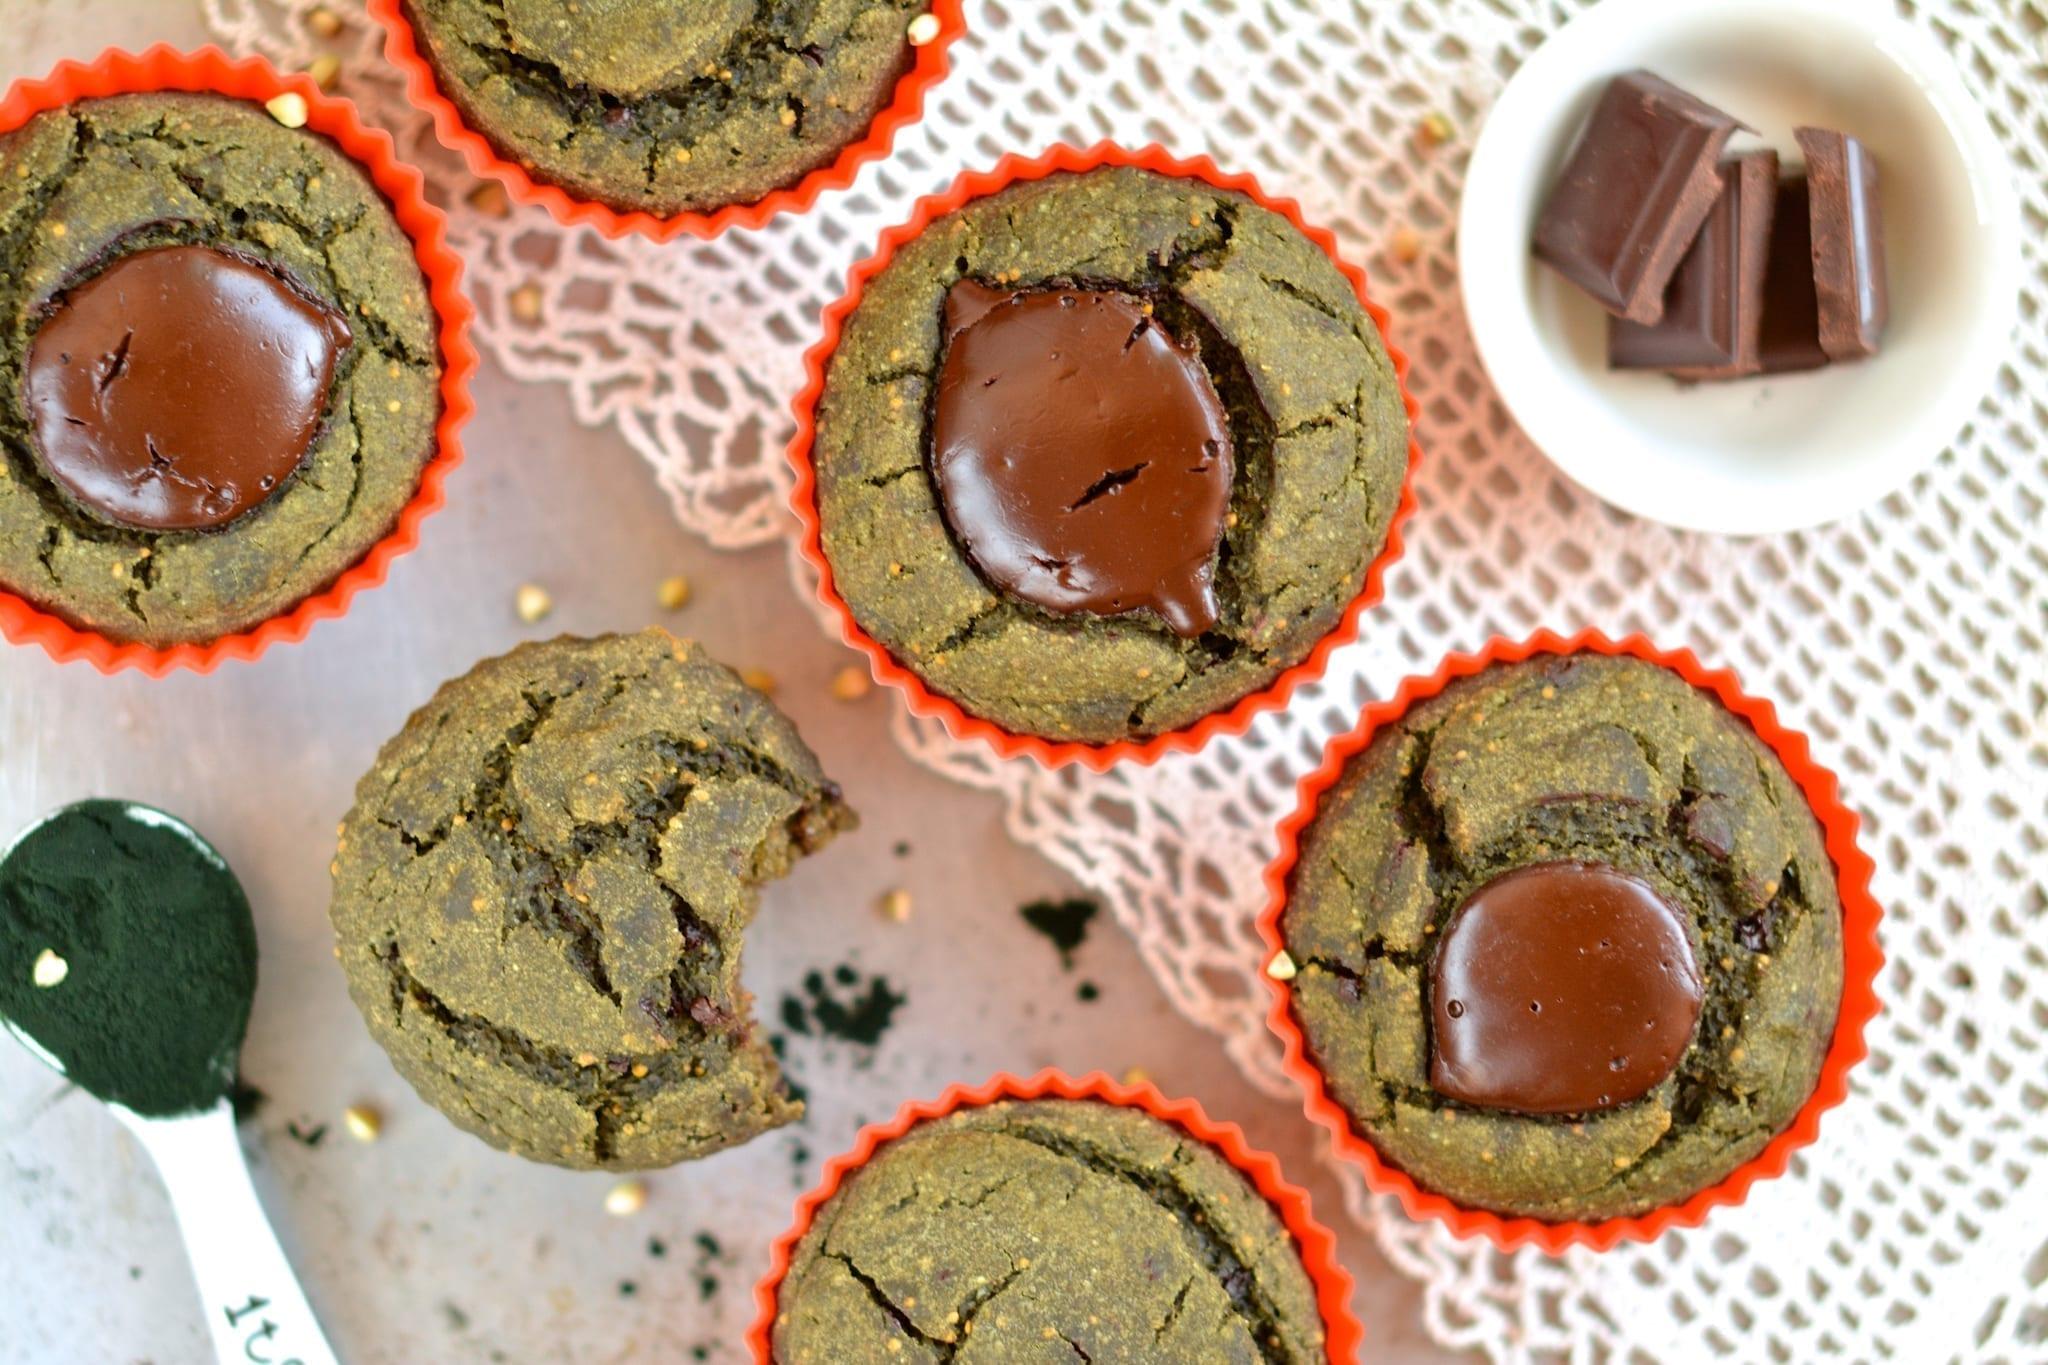 Muffins, Spirulina-Buckwheat, Oil-Free, Sugar-Free